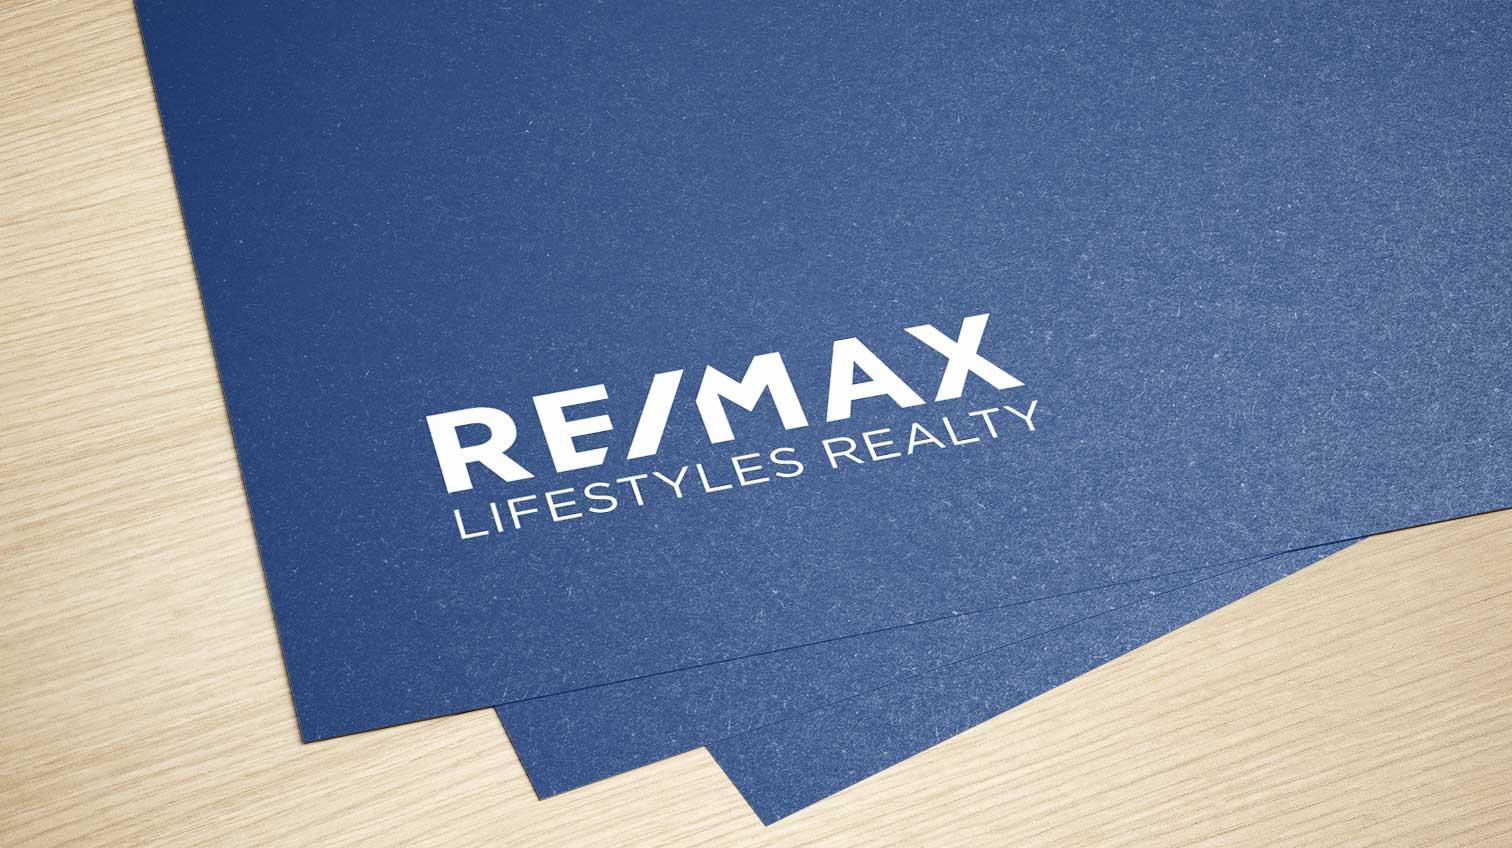 RE/MAX logo on blue paper - White Canvas Design